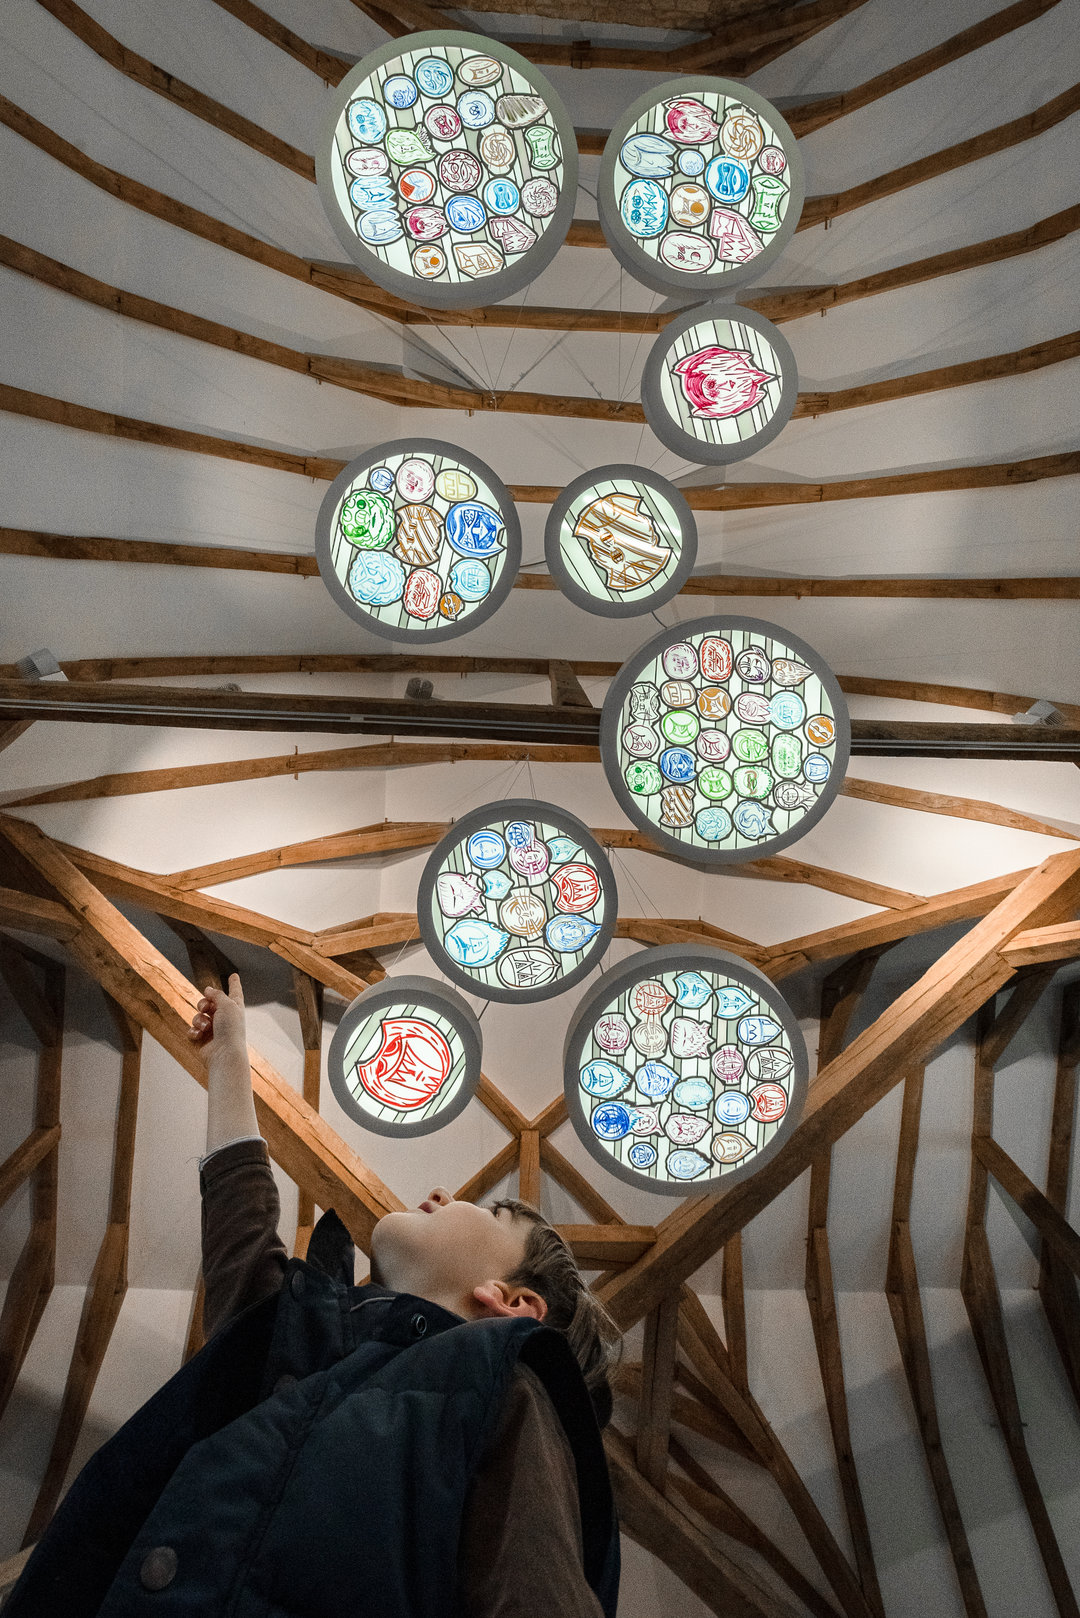 2019-04-24 MusÇe du vitrail - Yann Gachet - droits ok (4)